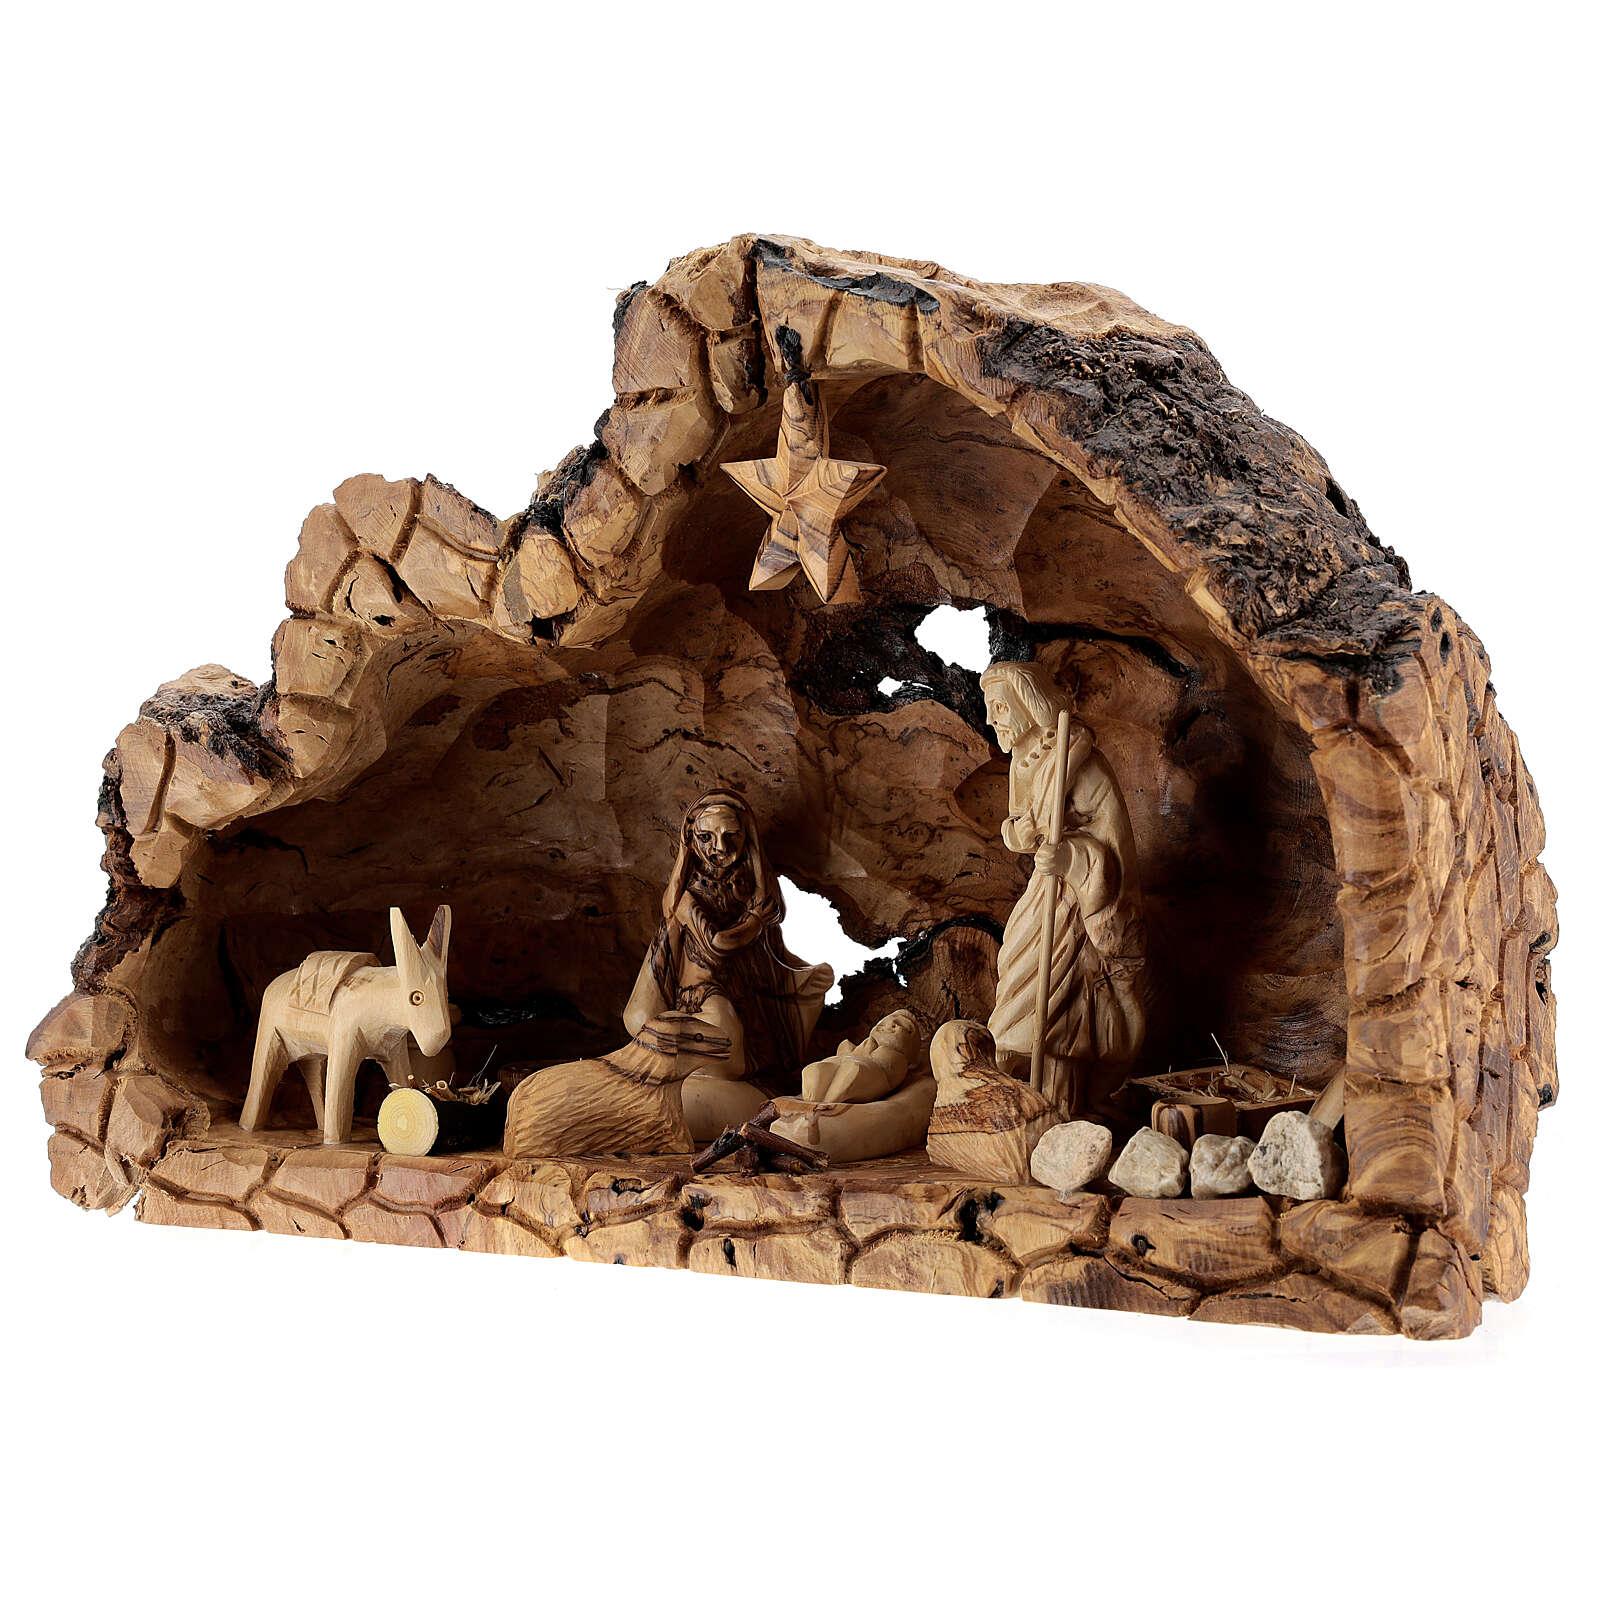 Capanna legno naturale Natività 10 cm ulivo Betlemme 20x35x15 cm 4